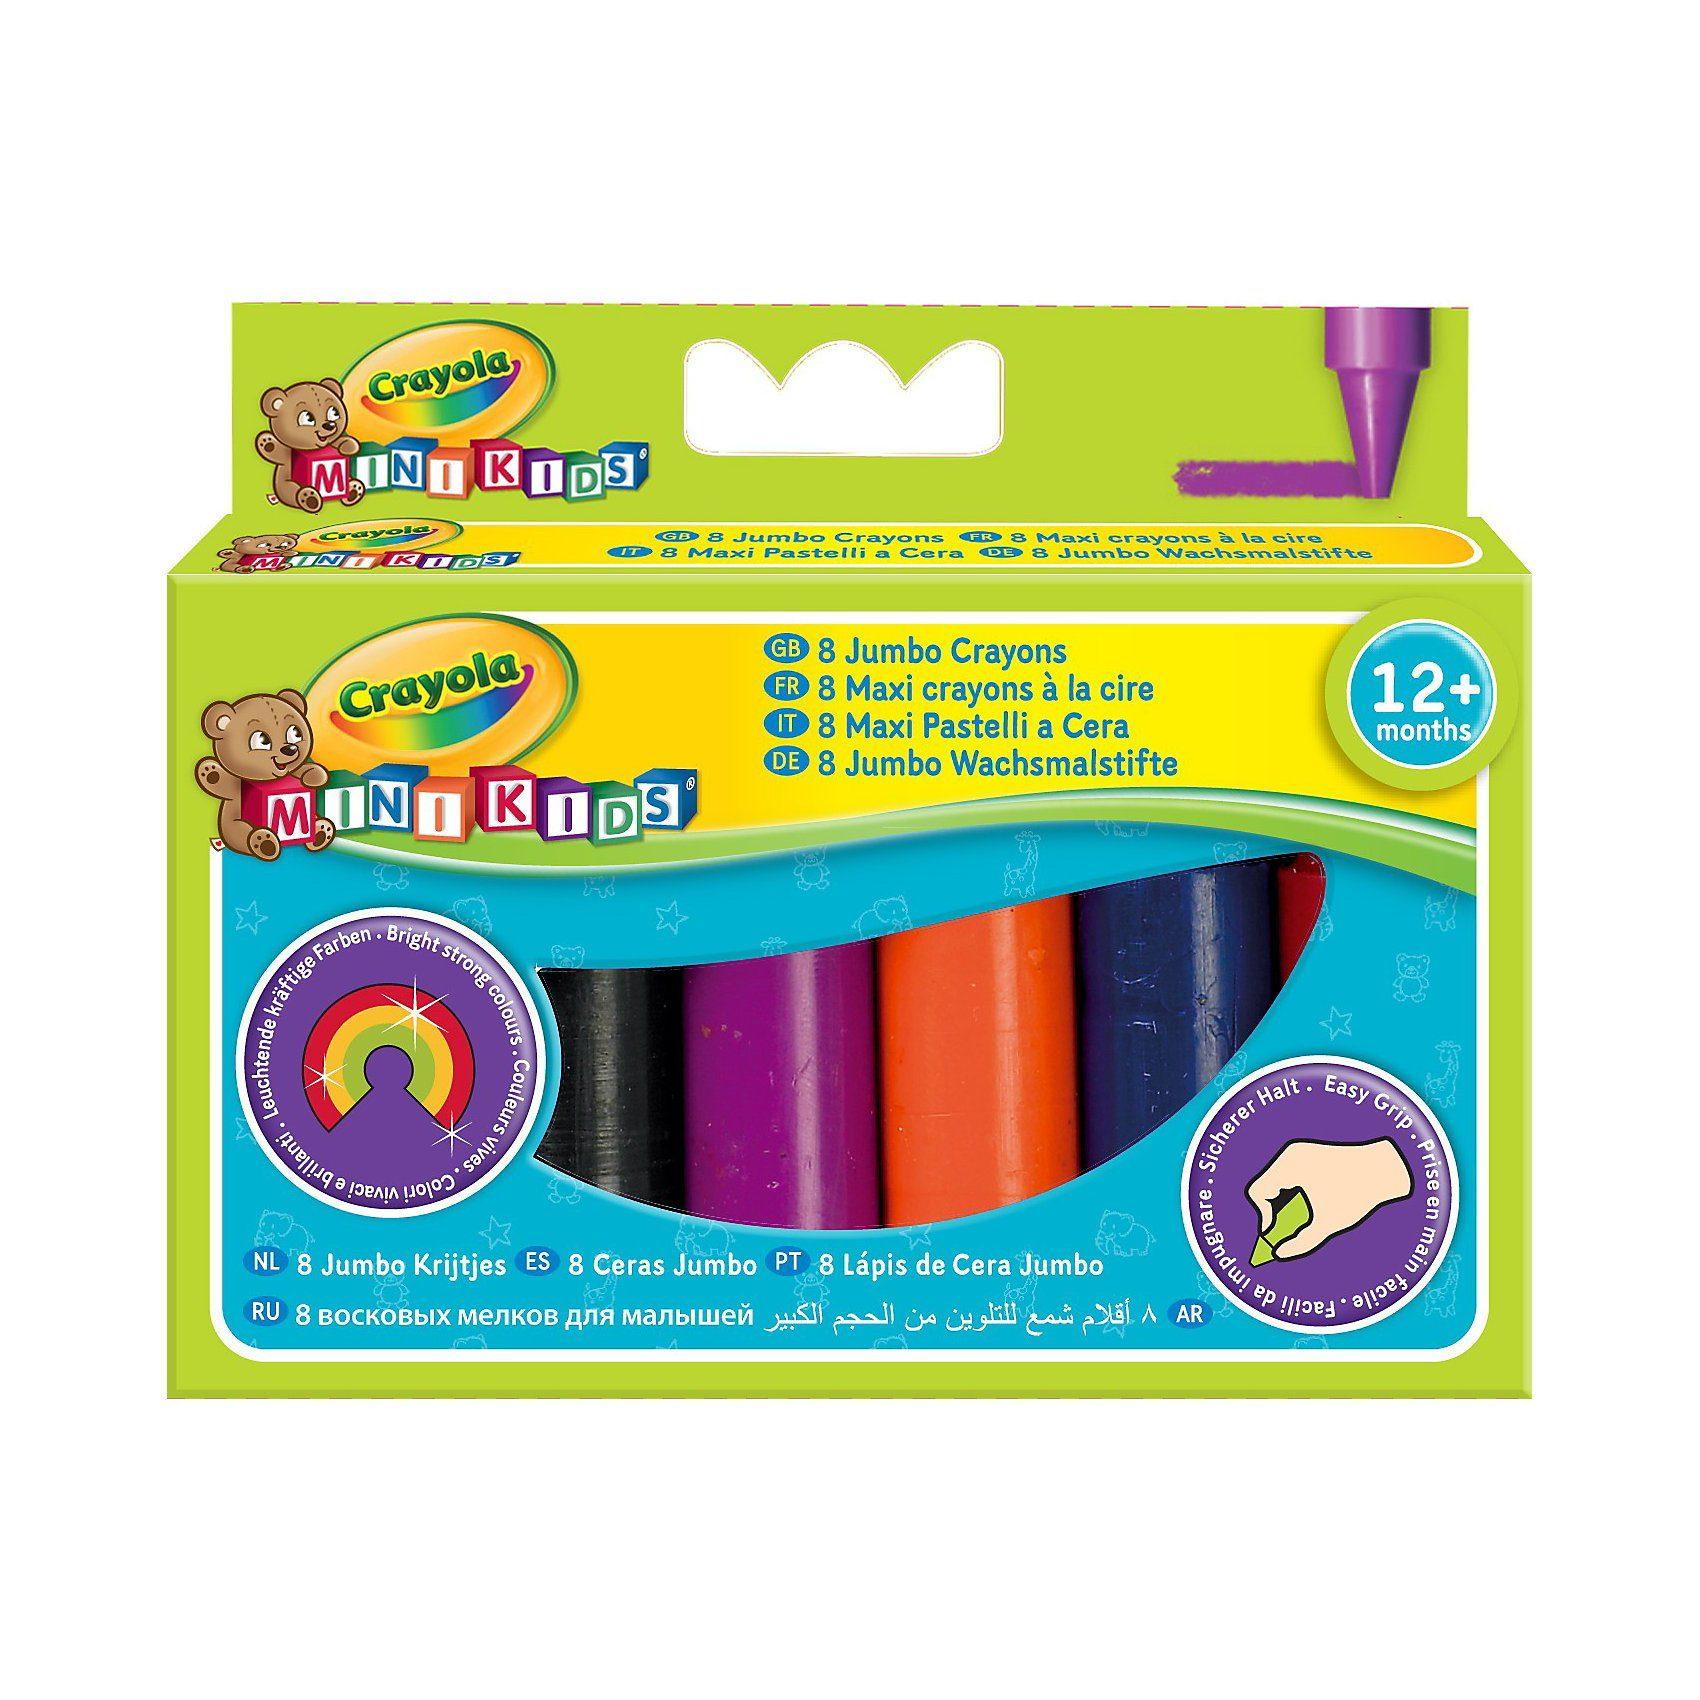 Crayola® MINI KIDS Jumbo Wachsmalstifte, 8-tlg.